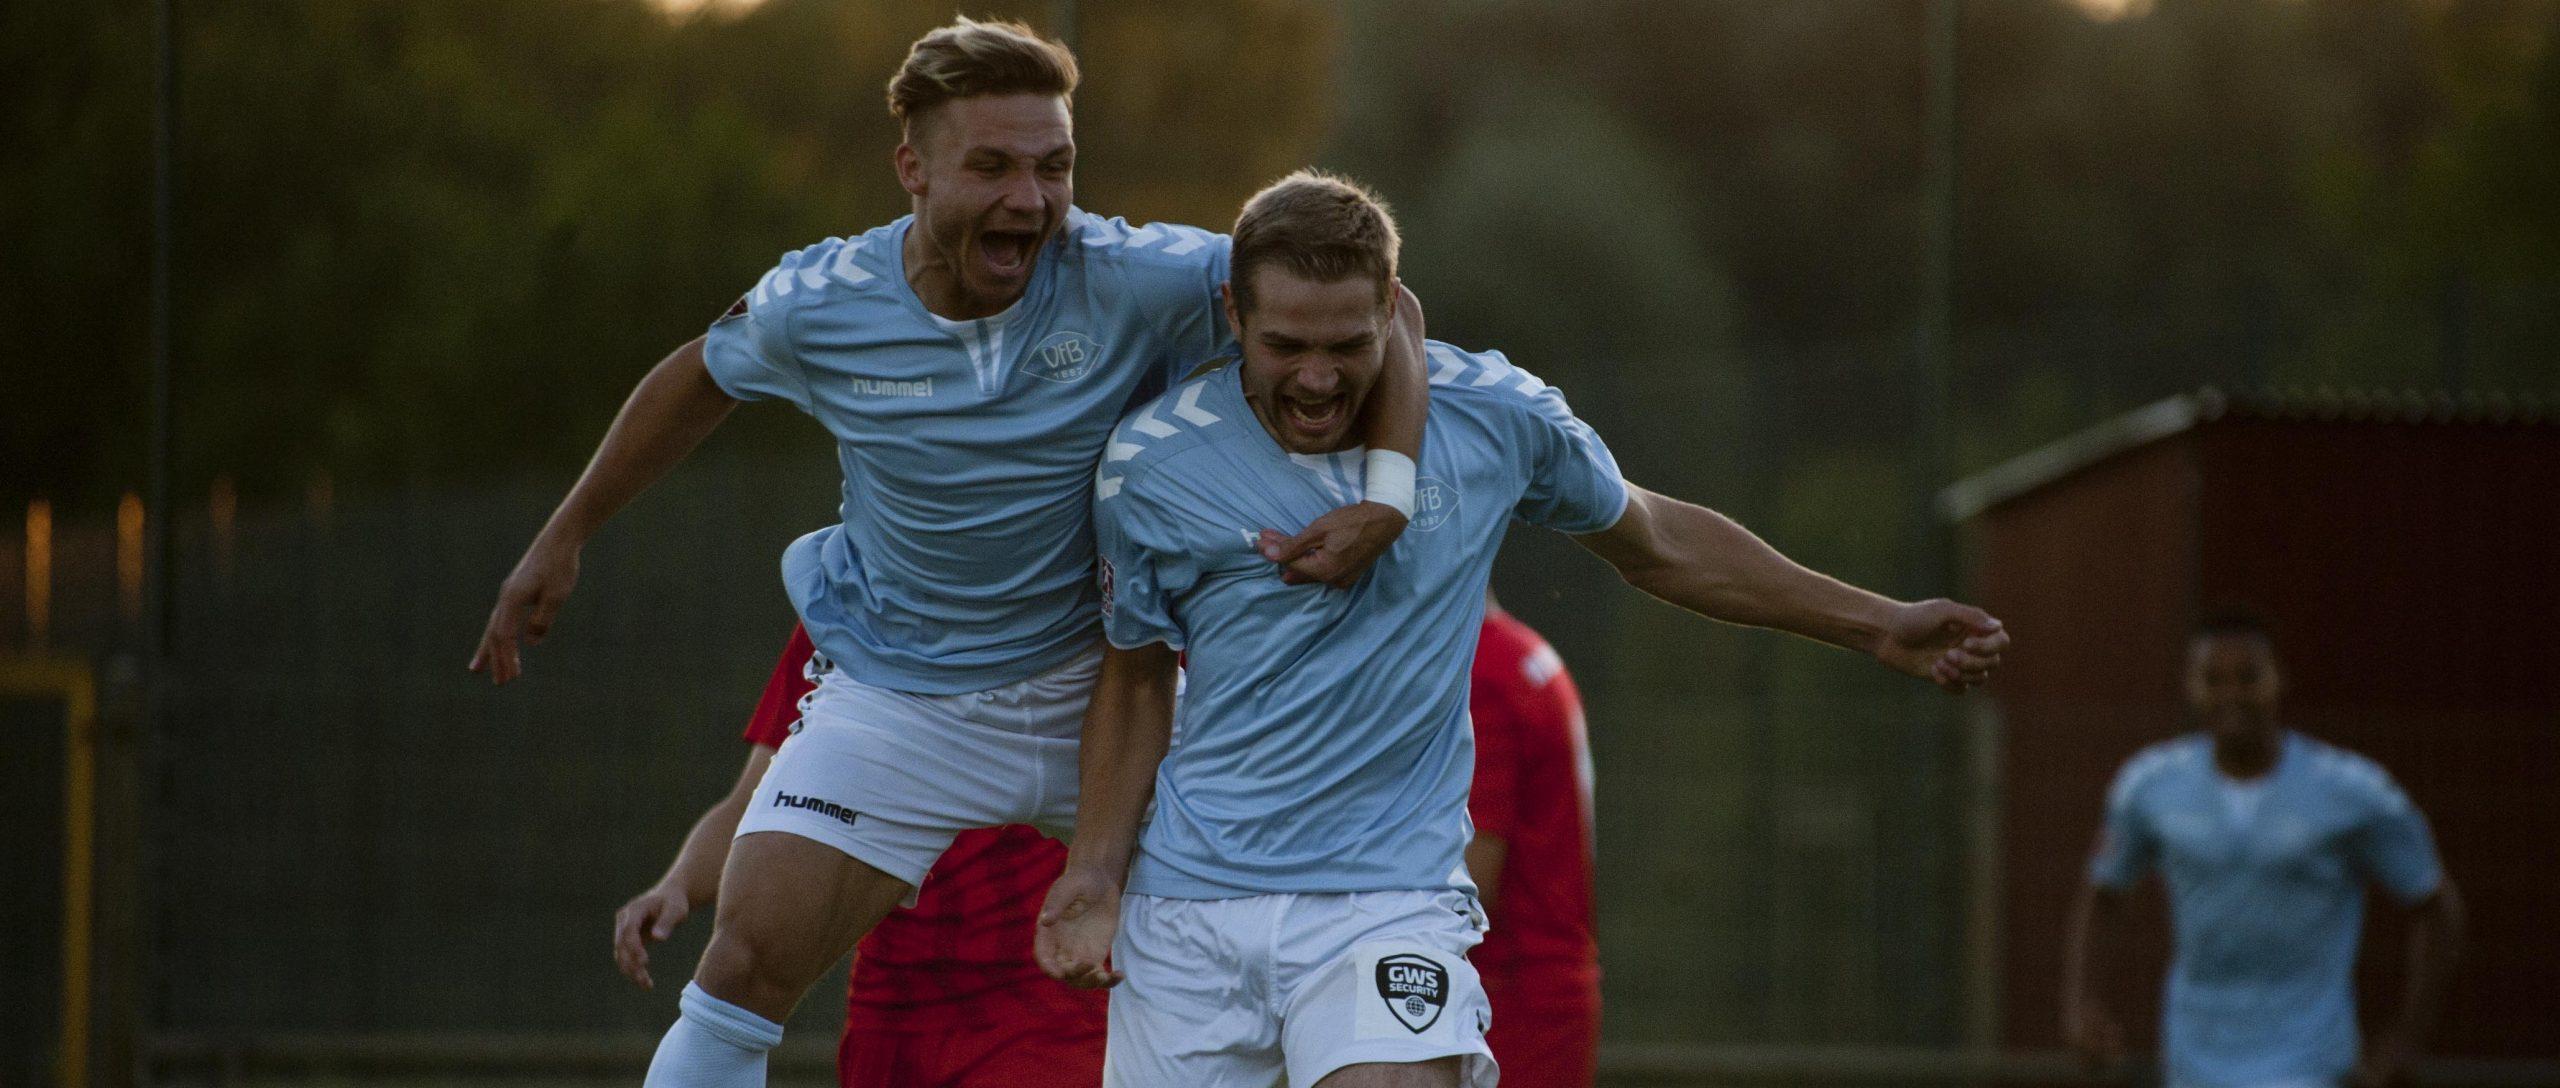 Souveräner VfB feiert vierten Sieg